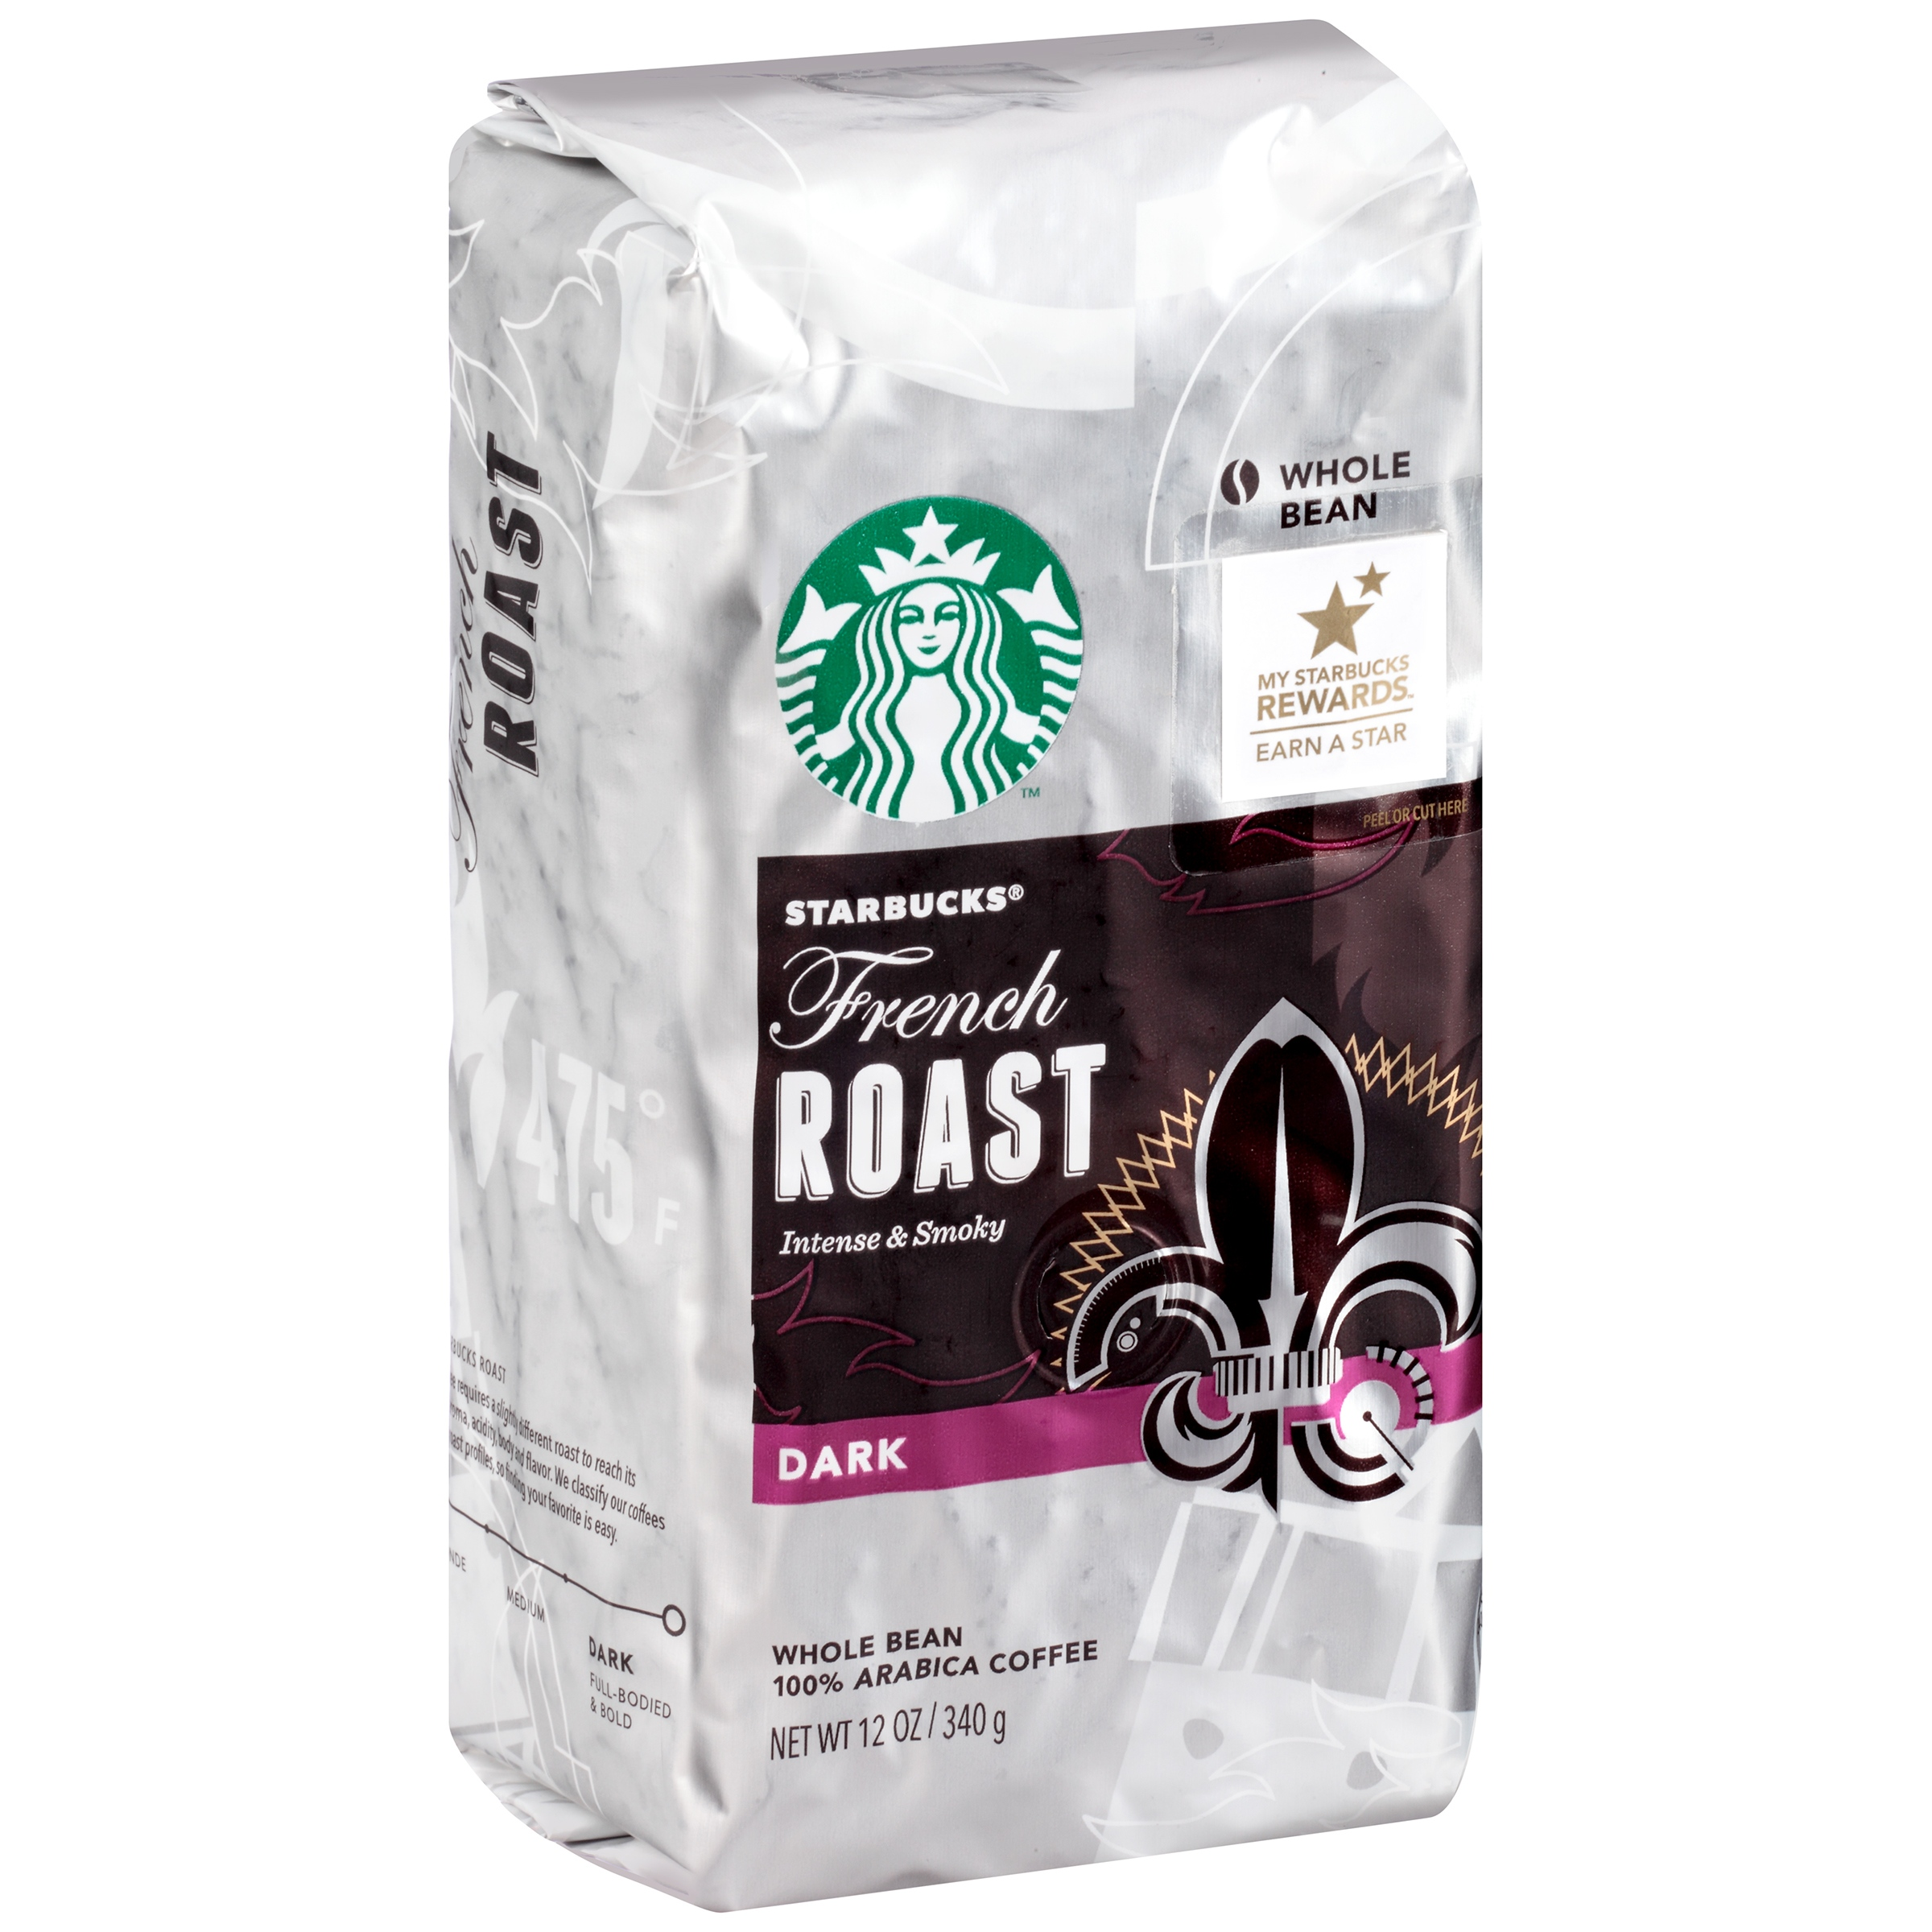 Starbucks French Roast Dark Whole Bean Coffee, 12.0 OZ